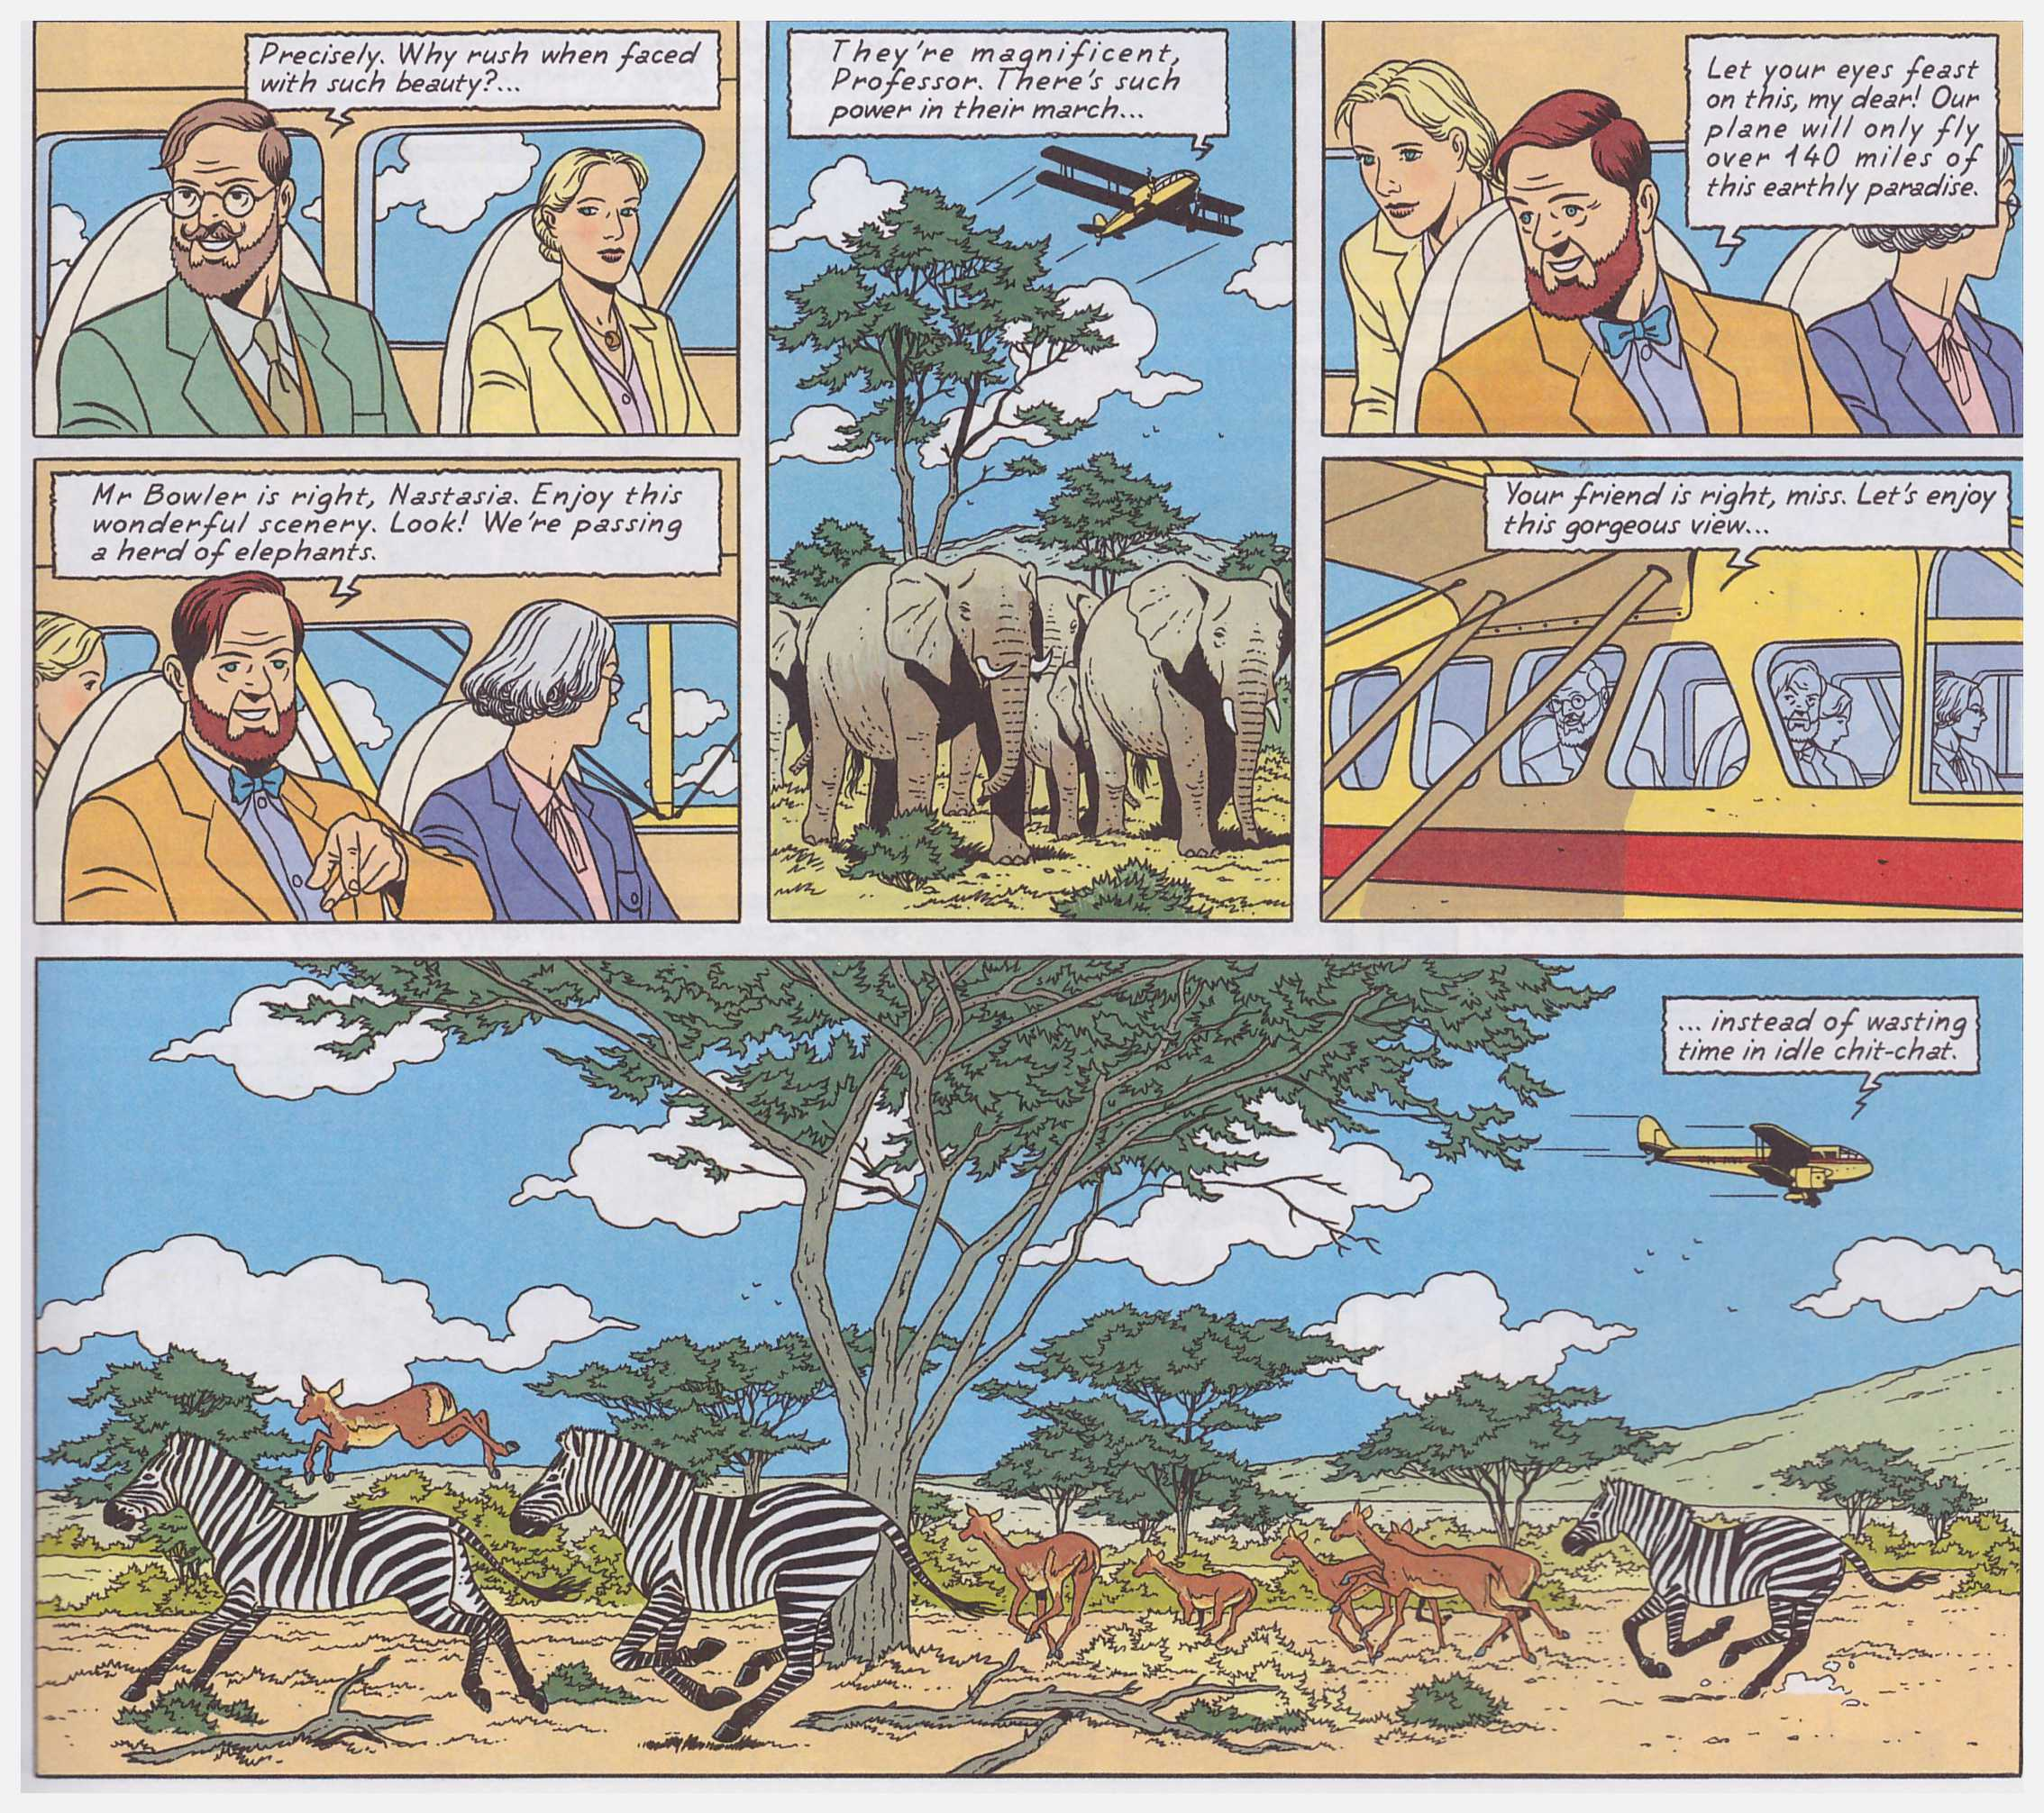 Blake and Mortimer The Gondwana Shrine review